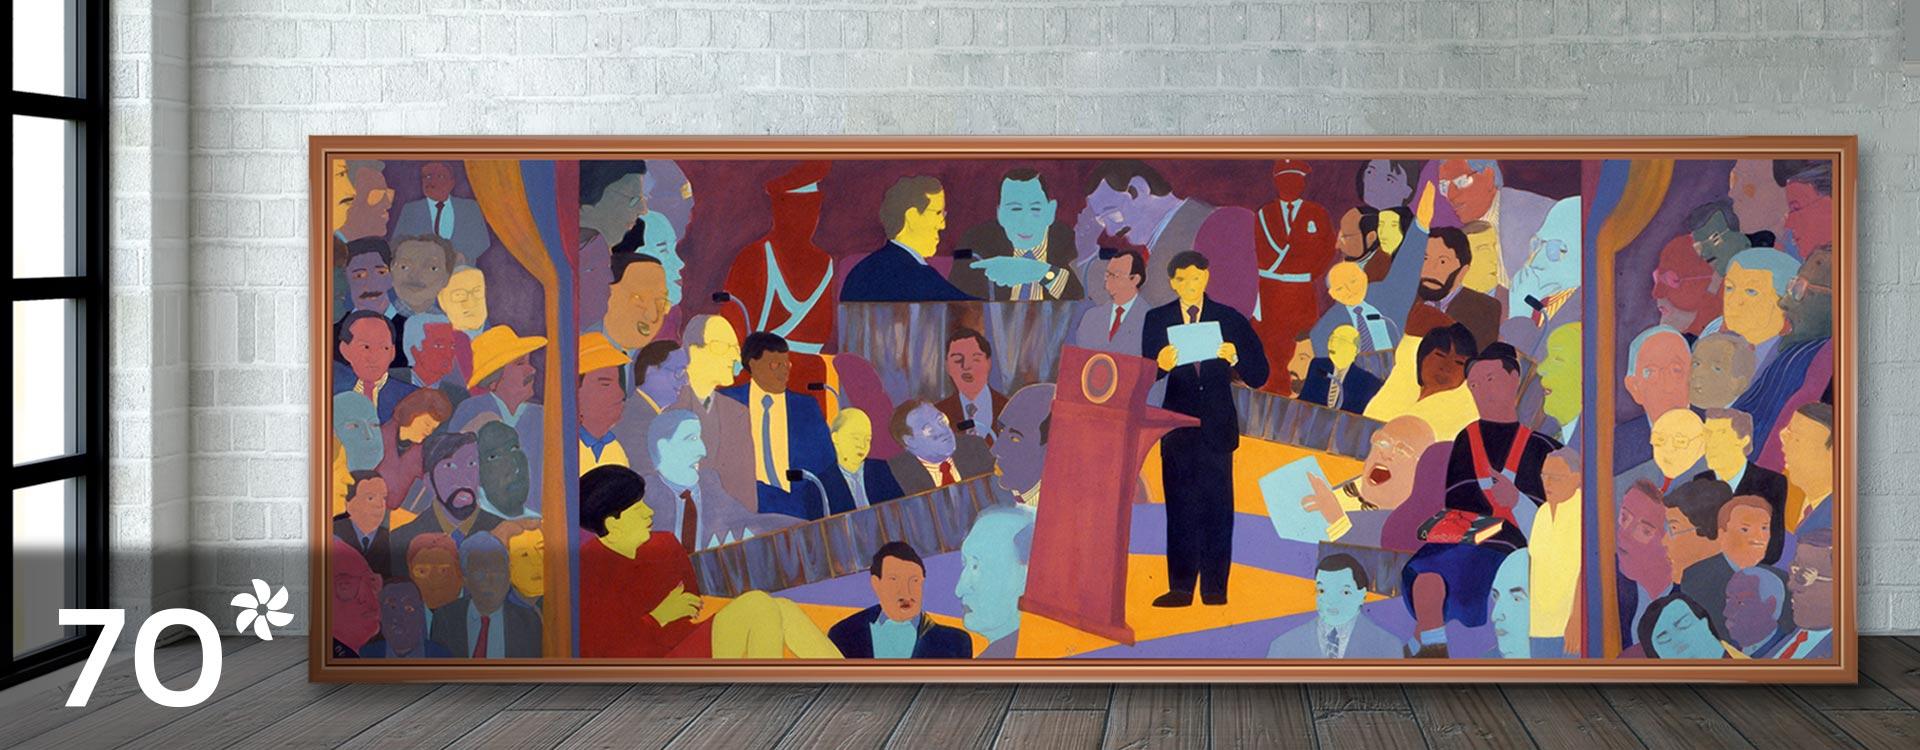 Imagen del cuadro La Constituyente, obra  de Beatríz González.